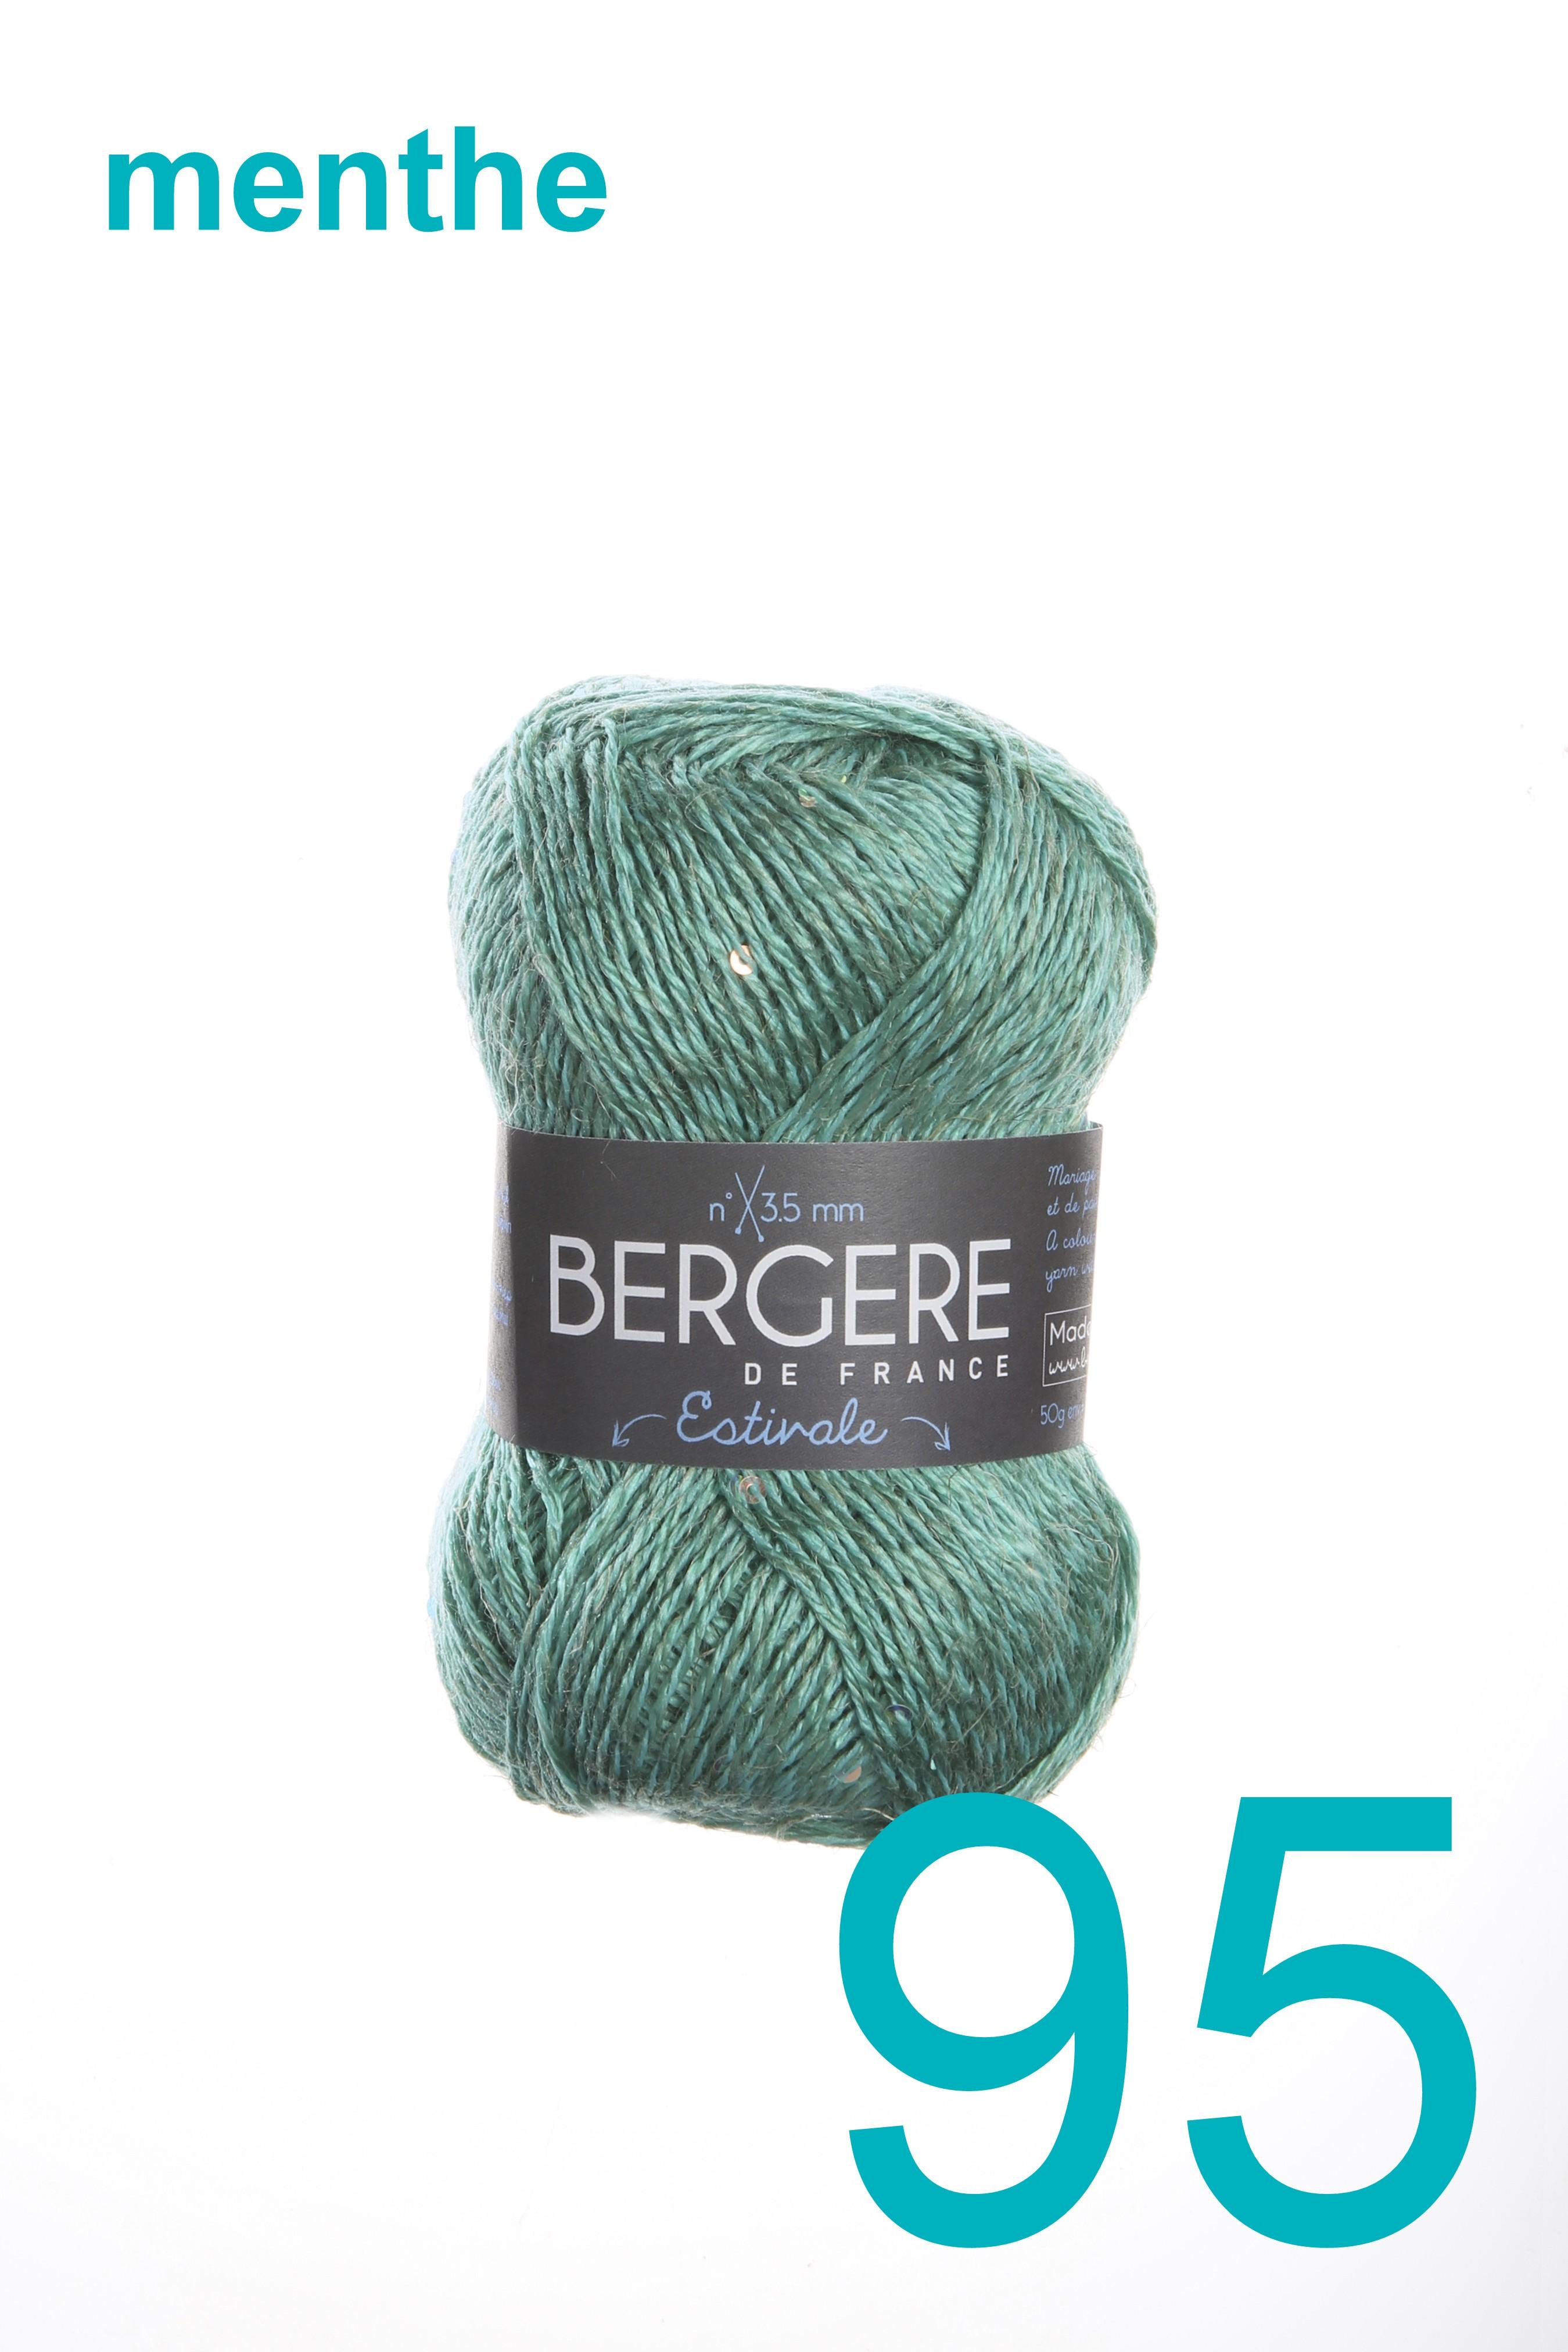 Bergere Ecoton menthe 95